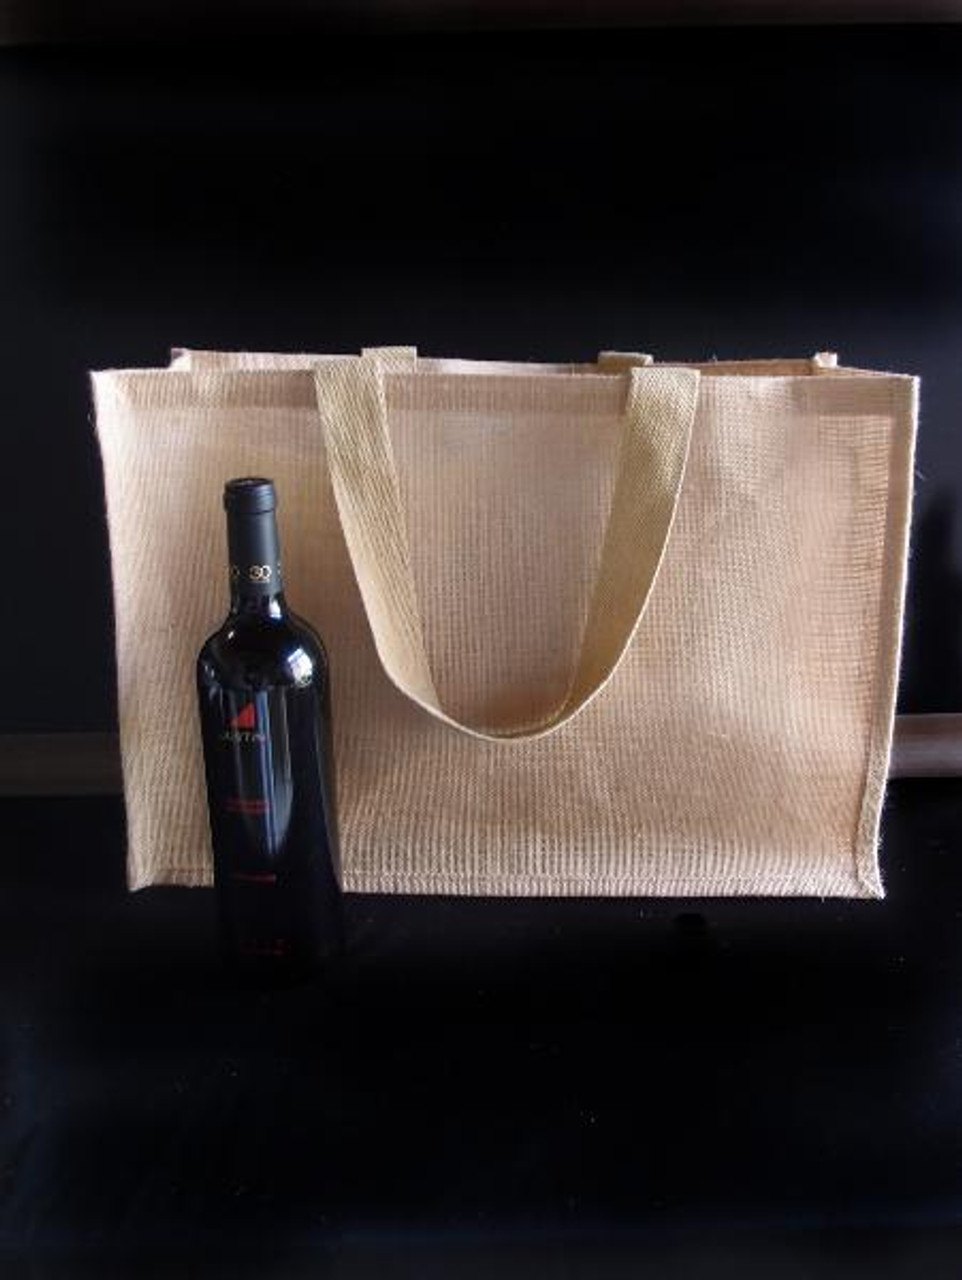 Jute Tote with Strap Handles 20 x 13.5 x 6 inches B879-21, Jute Tote Bags, Wholesale Burlap Tote Bags